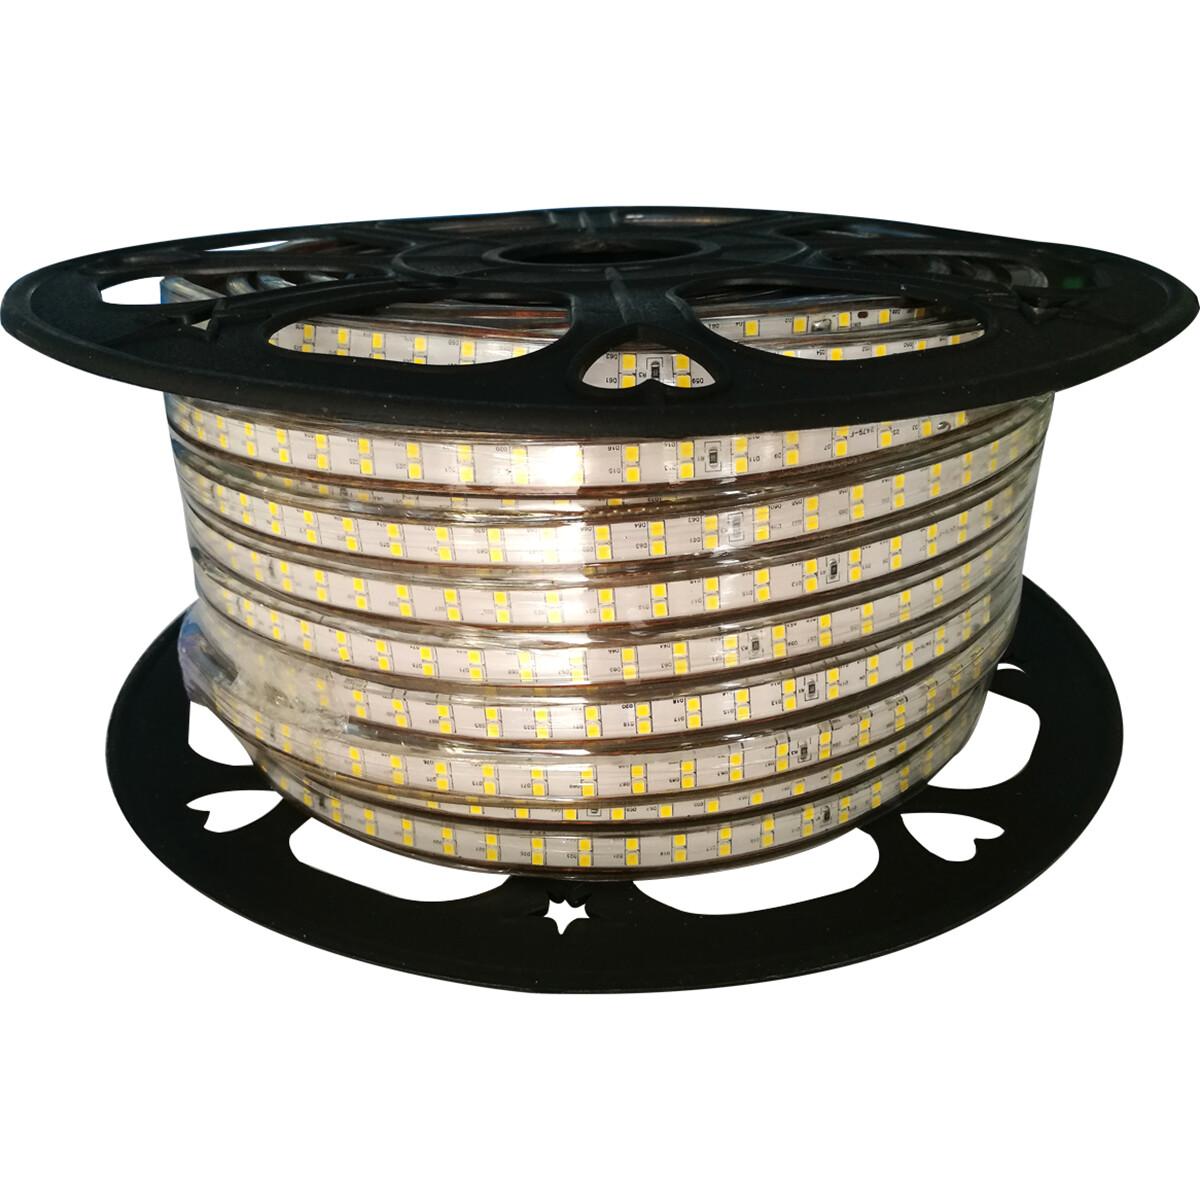 LED Strip - Aigi Strobi - 50 Meter - Dimbaar - IP65 Waterdicht - Warm Wit 3000K - 2835 SMD 230V